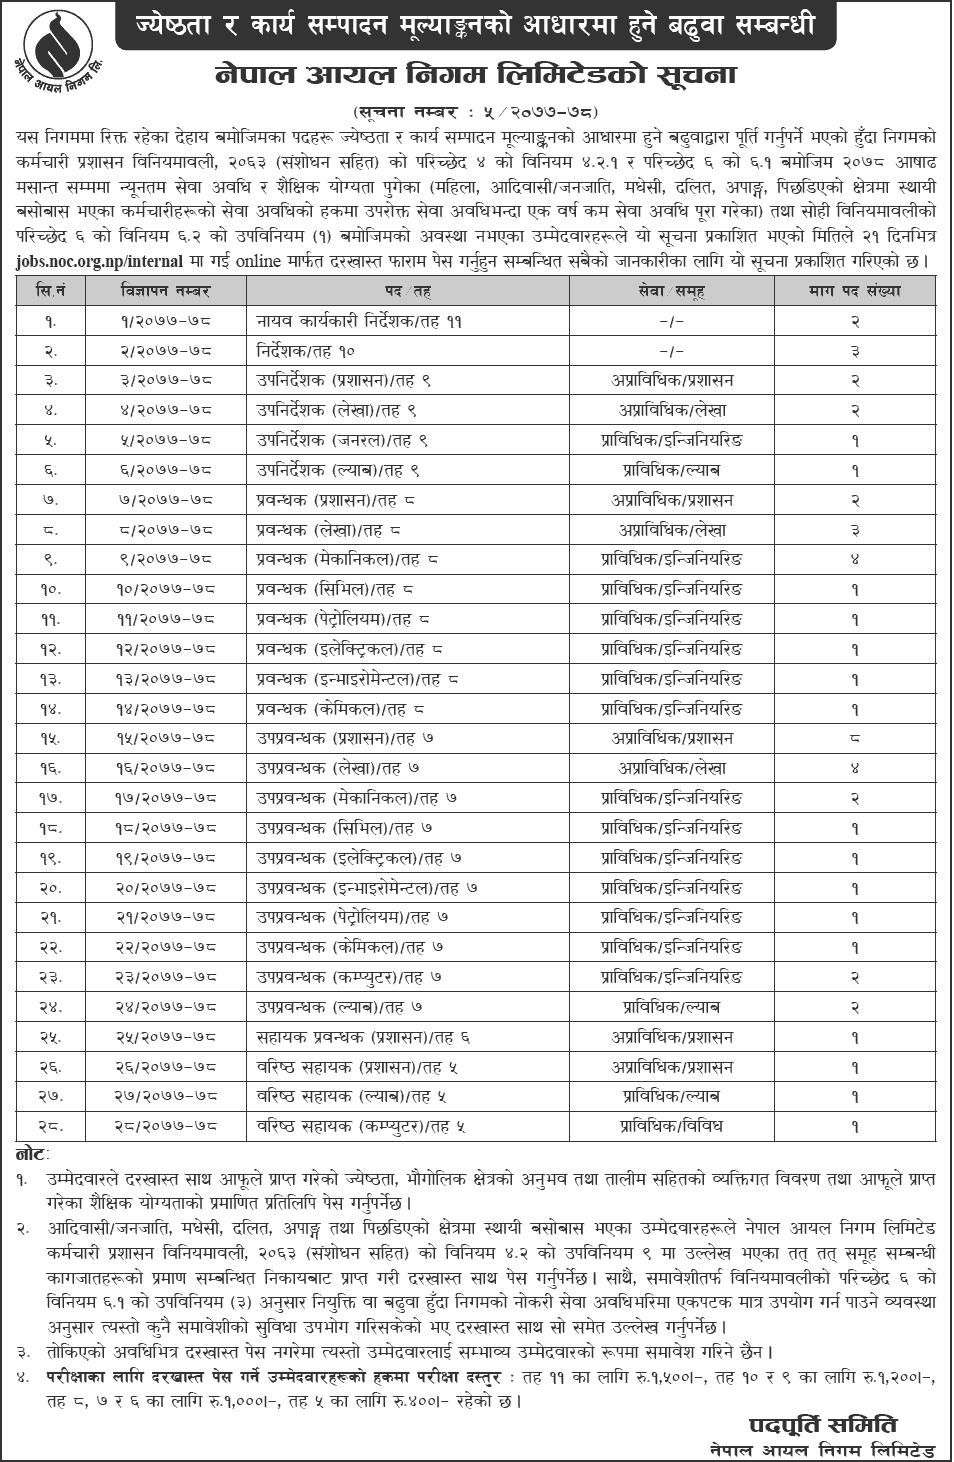 Performance Appraisal (Karya Sampadan Mulyankan) Details: